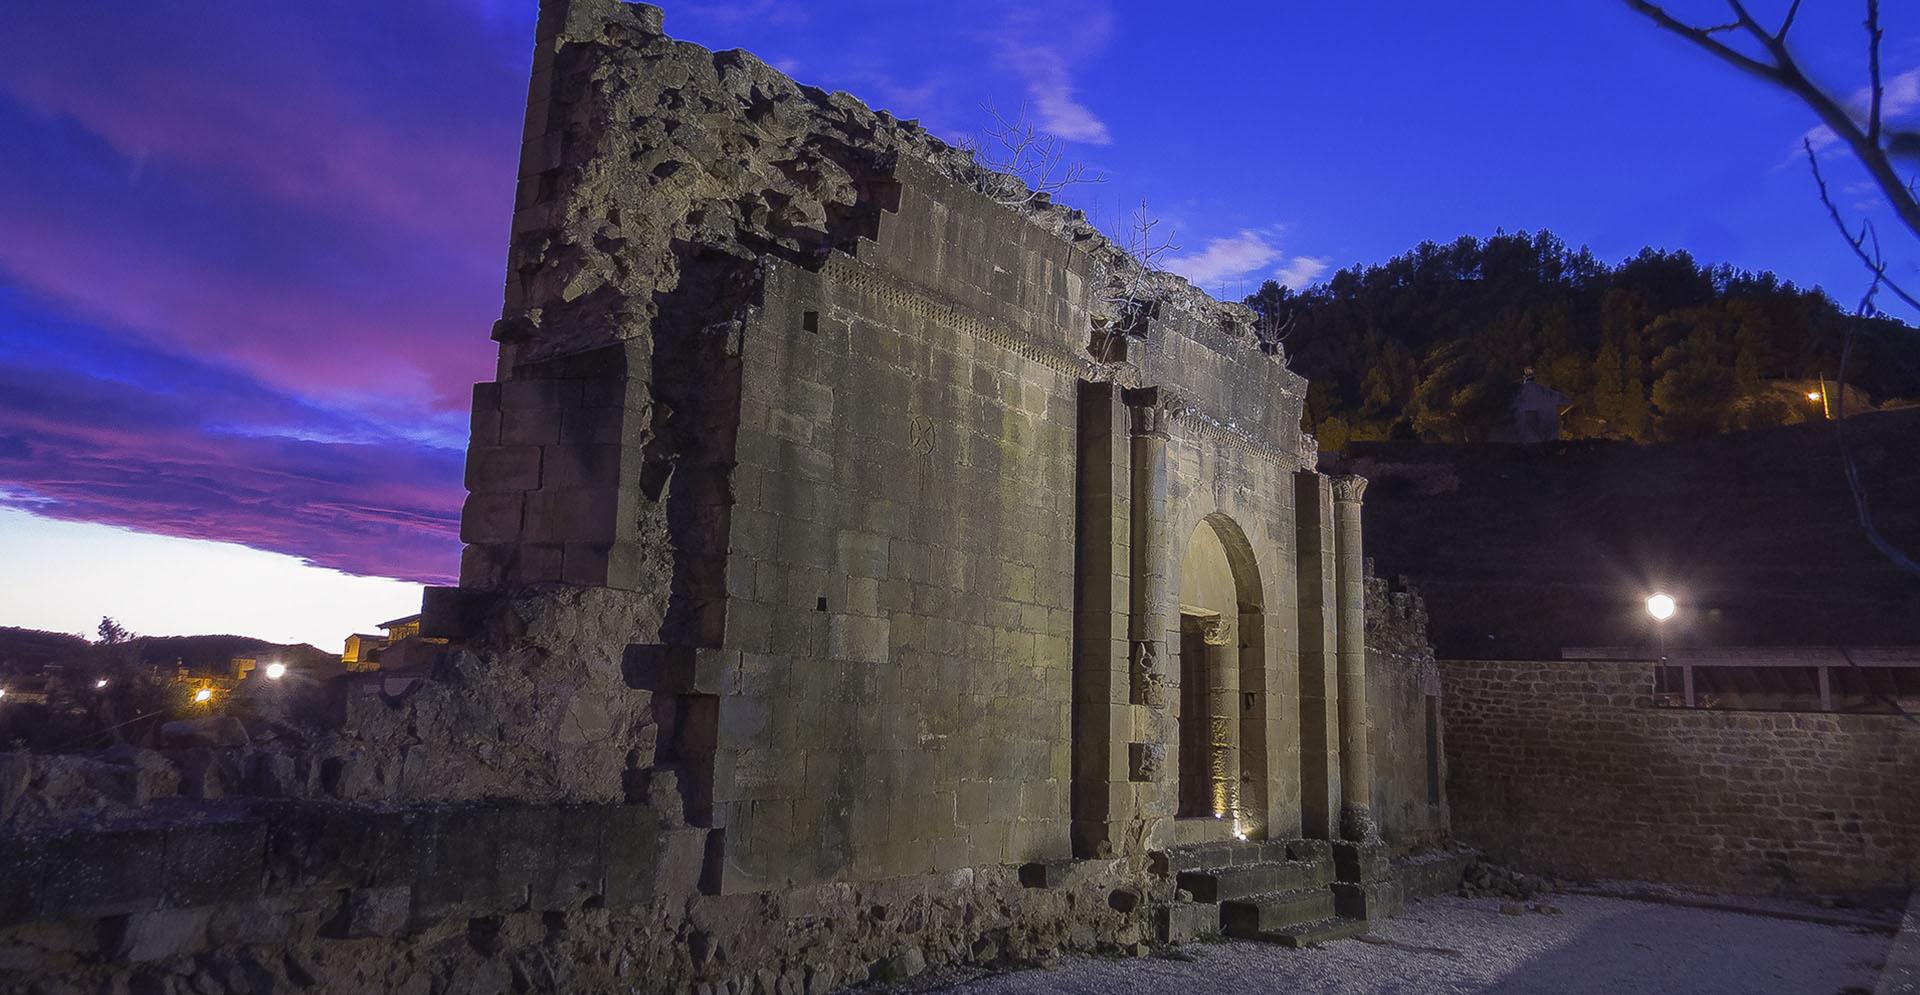 Atardecer en las ruinas de la Iglesia de San Lorenzo de Uncastillo